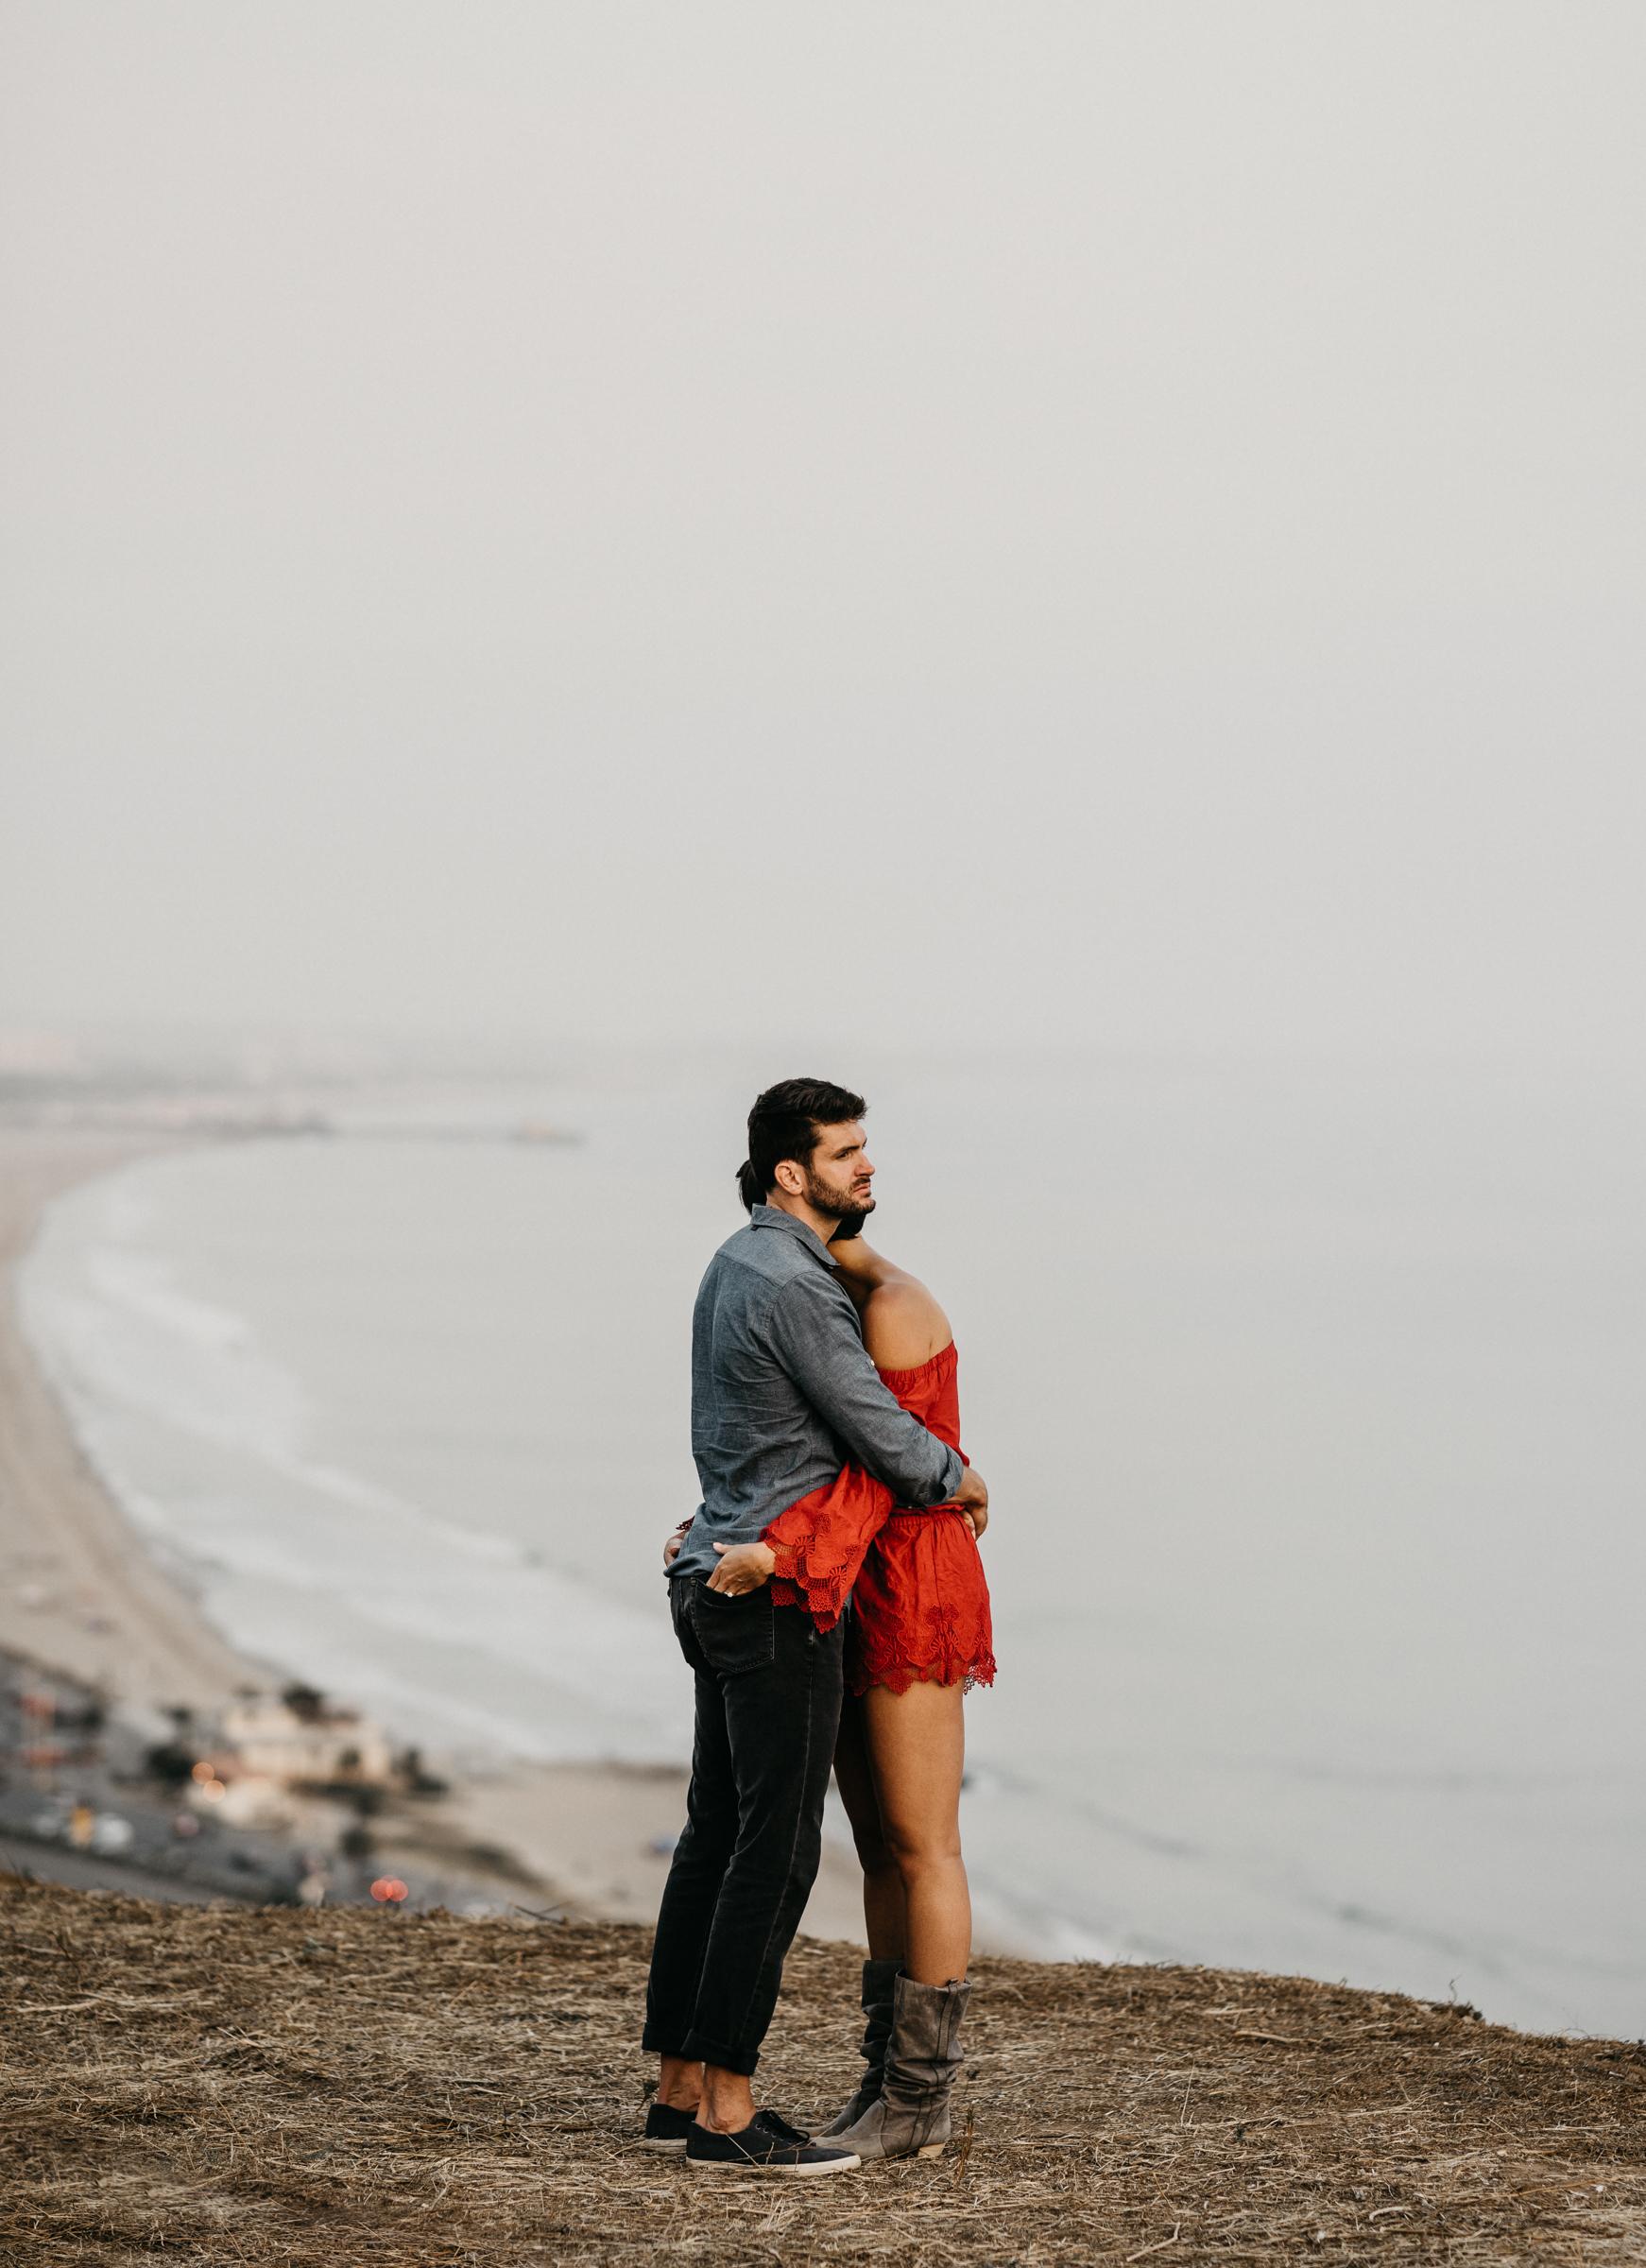 Isaiah + Taylor Photography - Santa Monica Engagement Session, Los Angeles Wedding Photographer-050.jpg